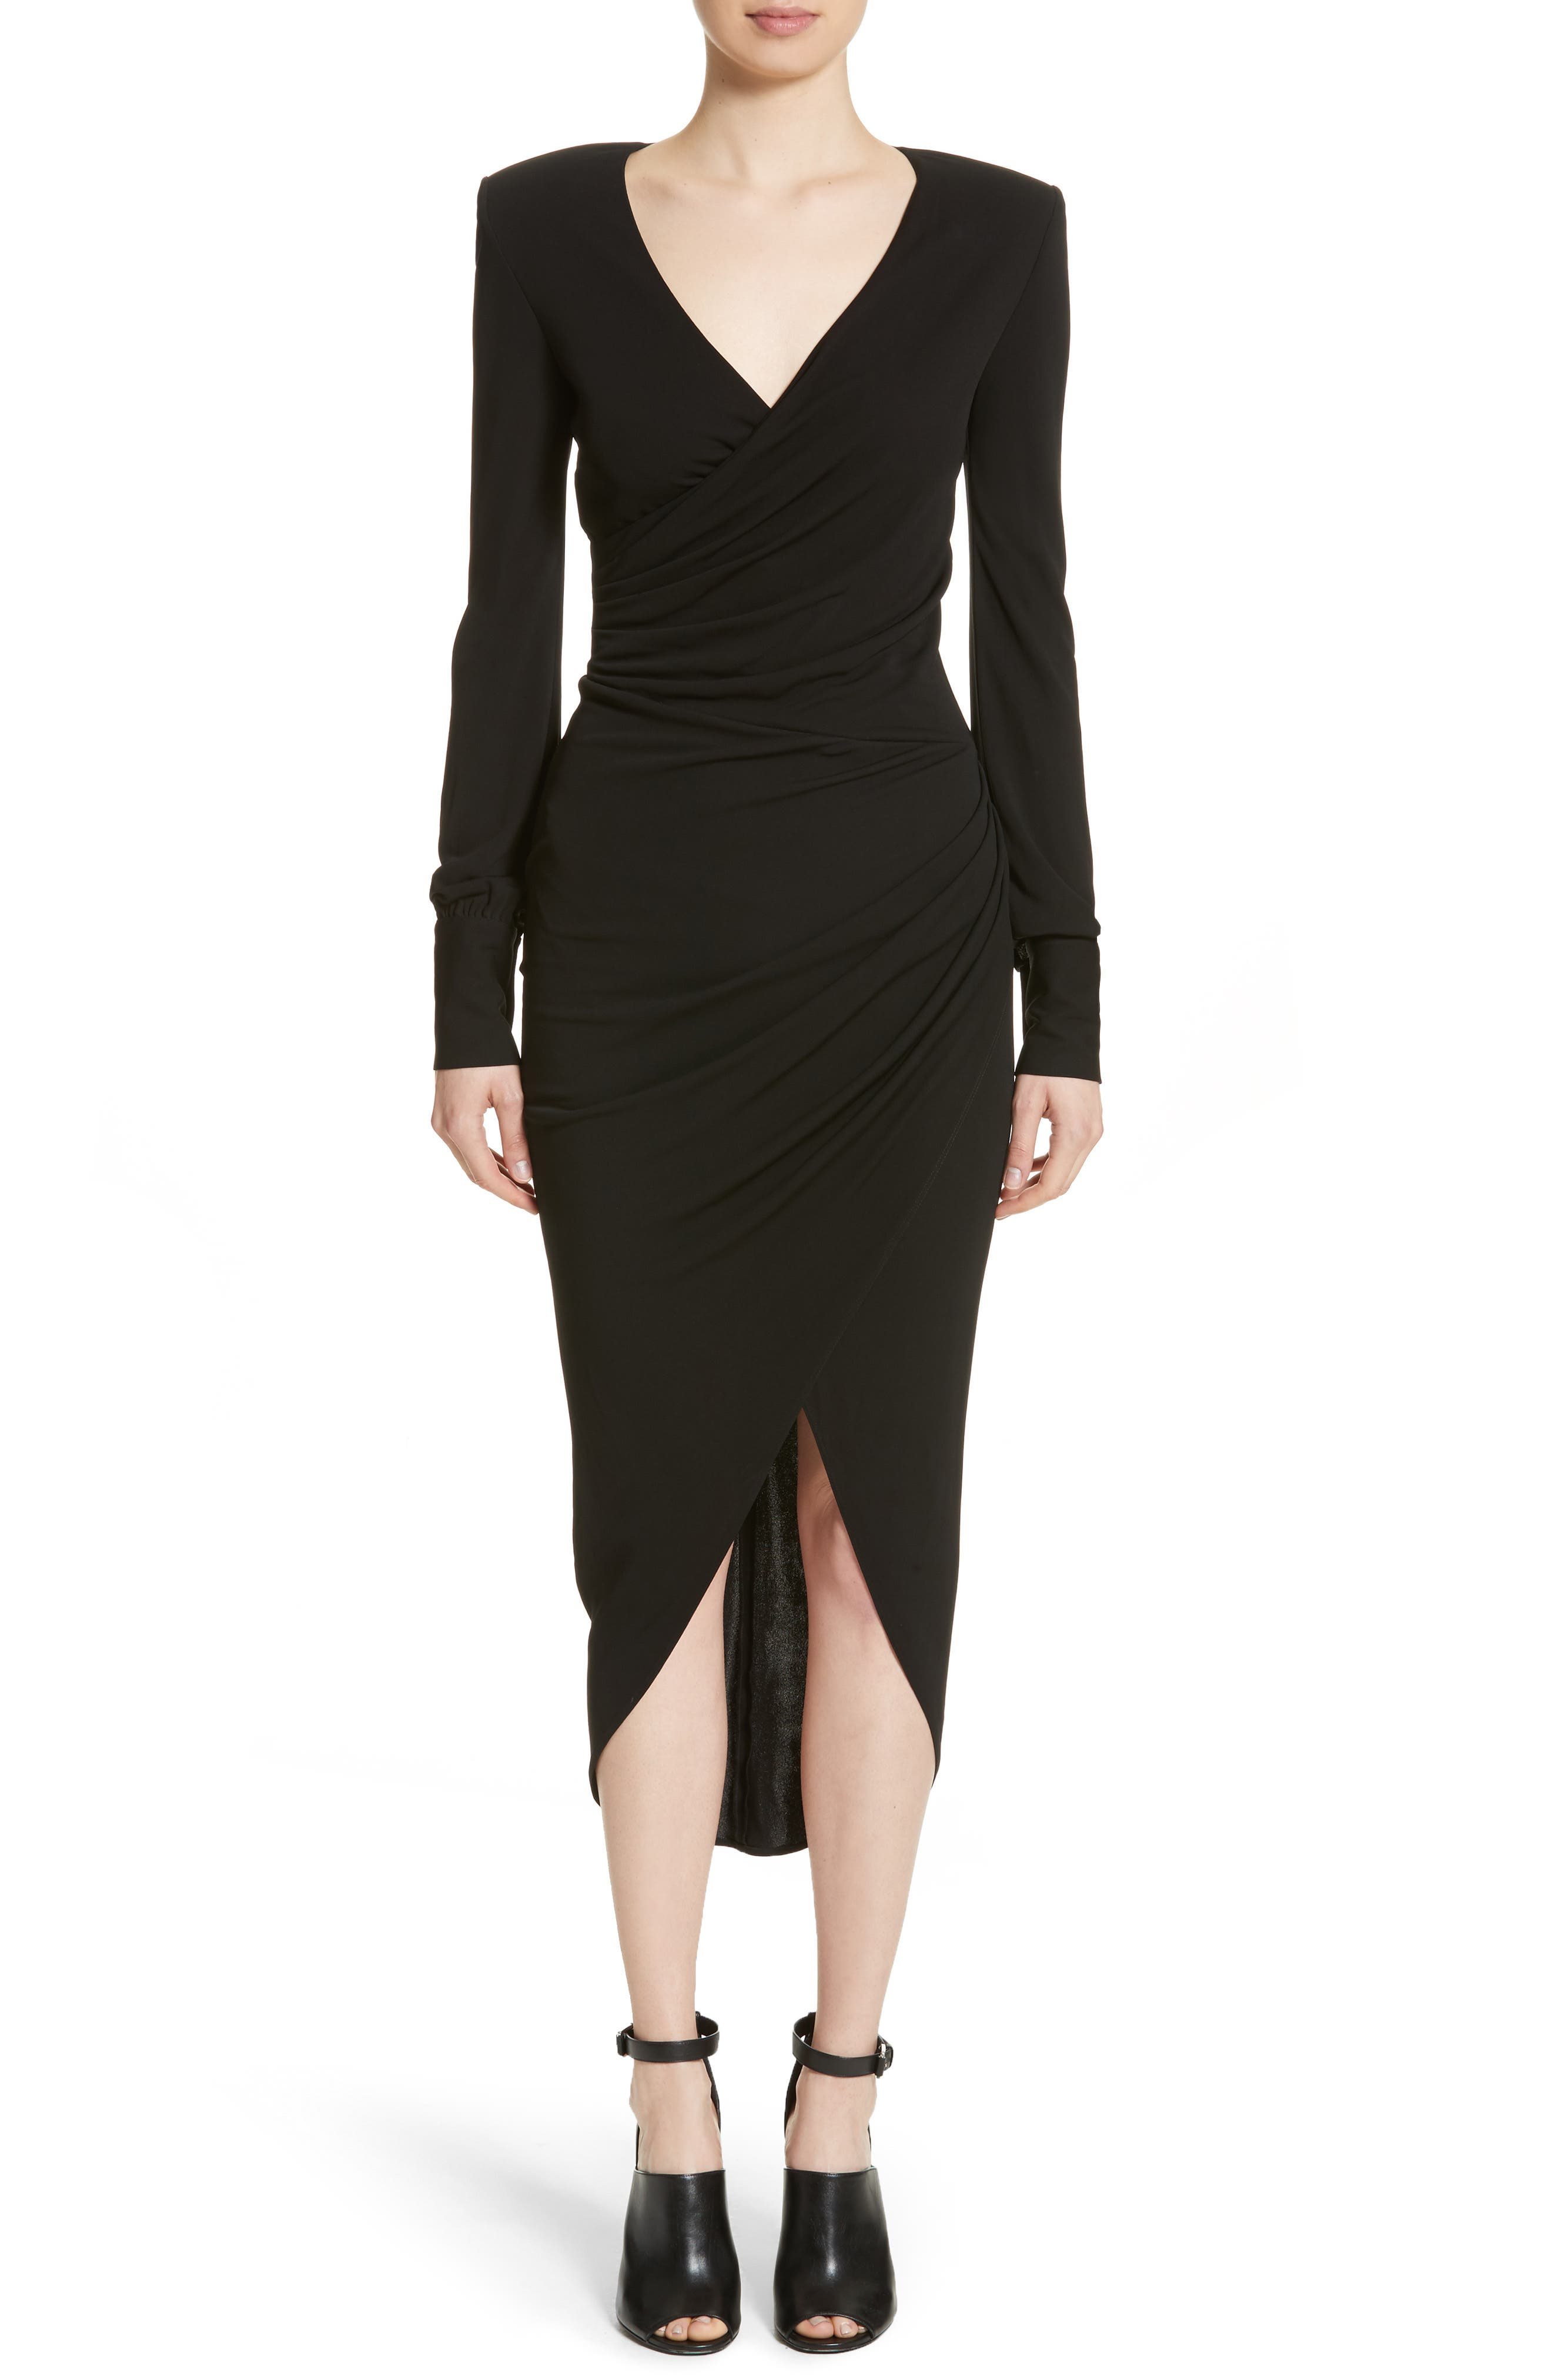 Alternate Image 1 Selected - Michael Kors Stretch Jersey Wrap Dress